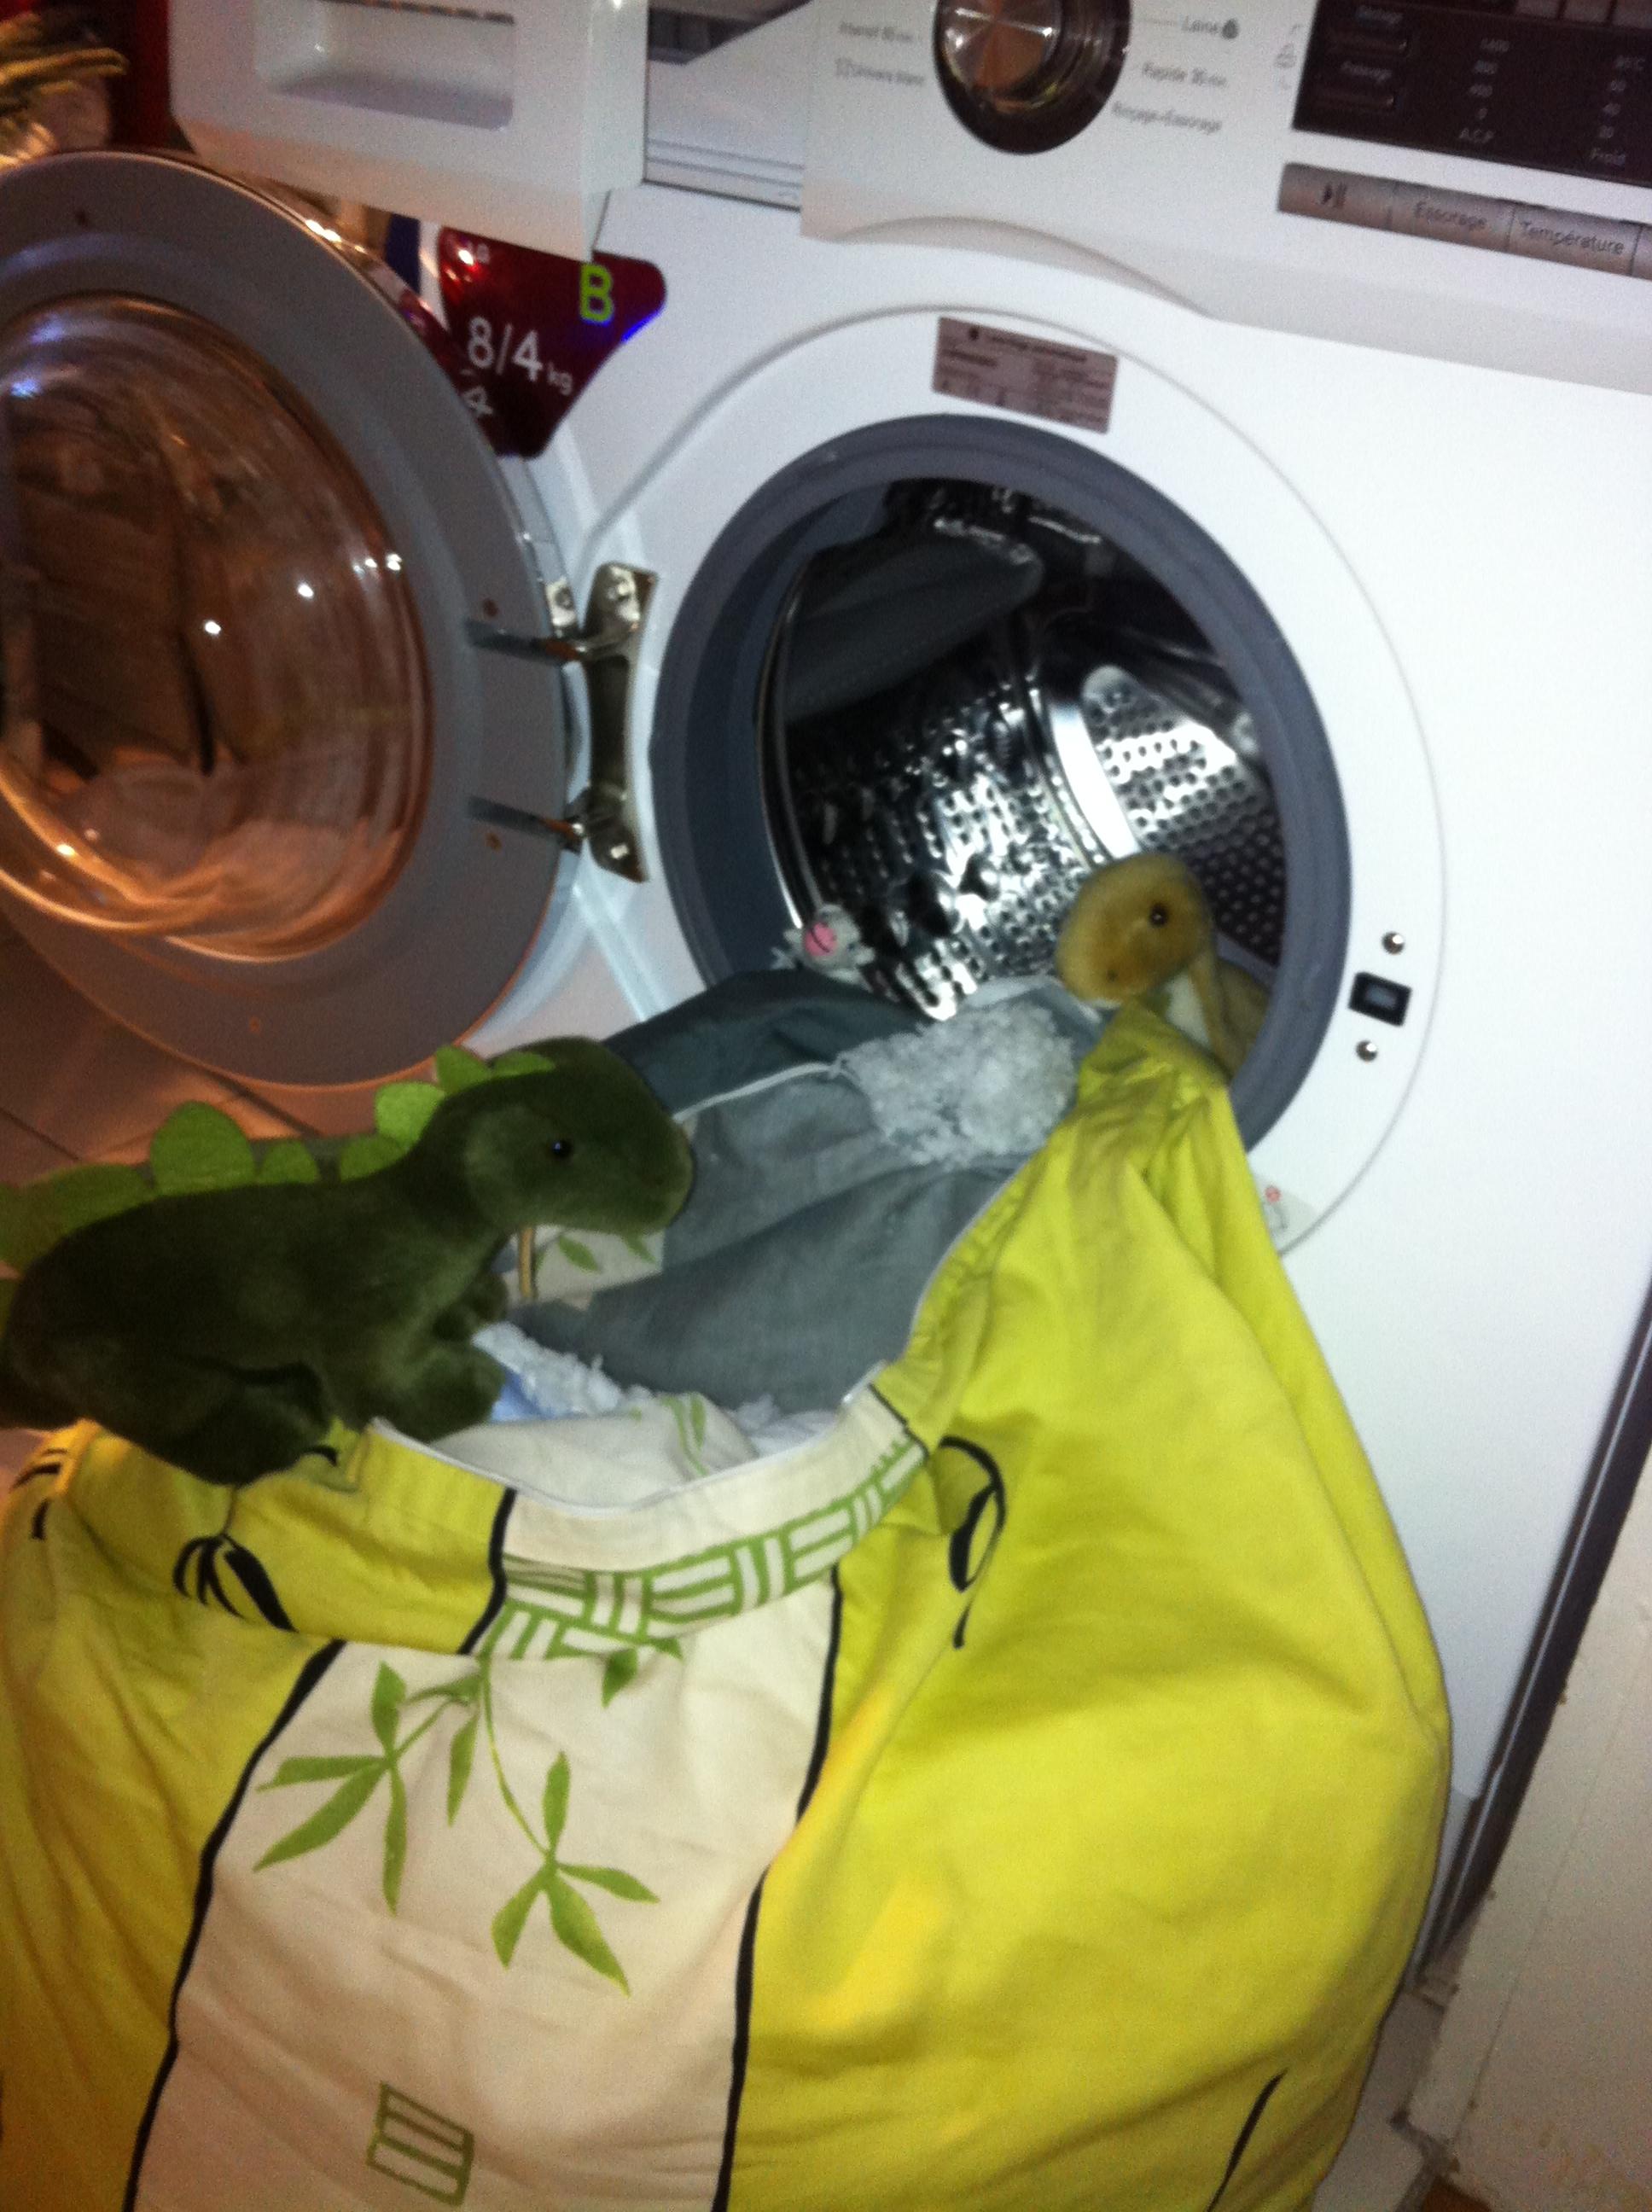 50 kapitel frau holle in der waschmaschine anatols. Black Bedroom Furniture Sets. Home Design Ideas